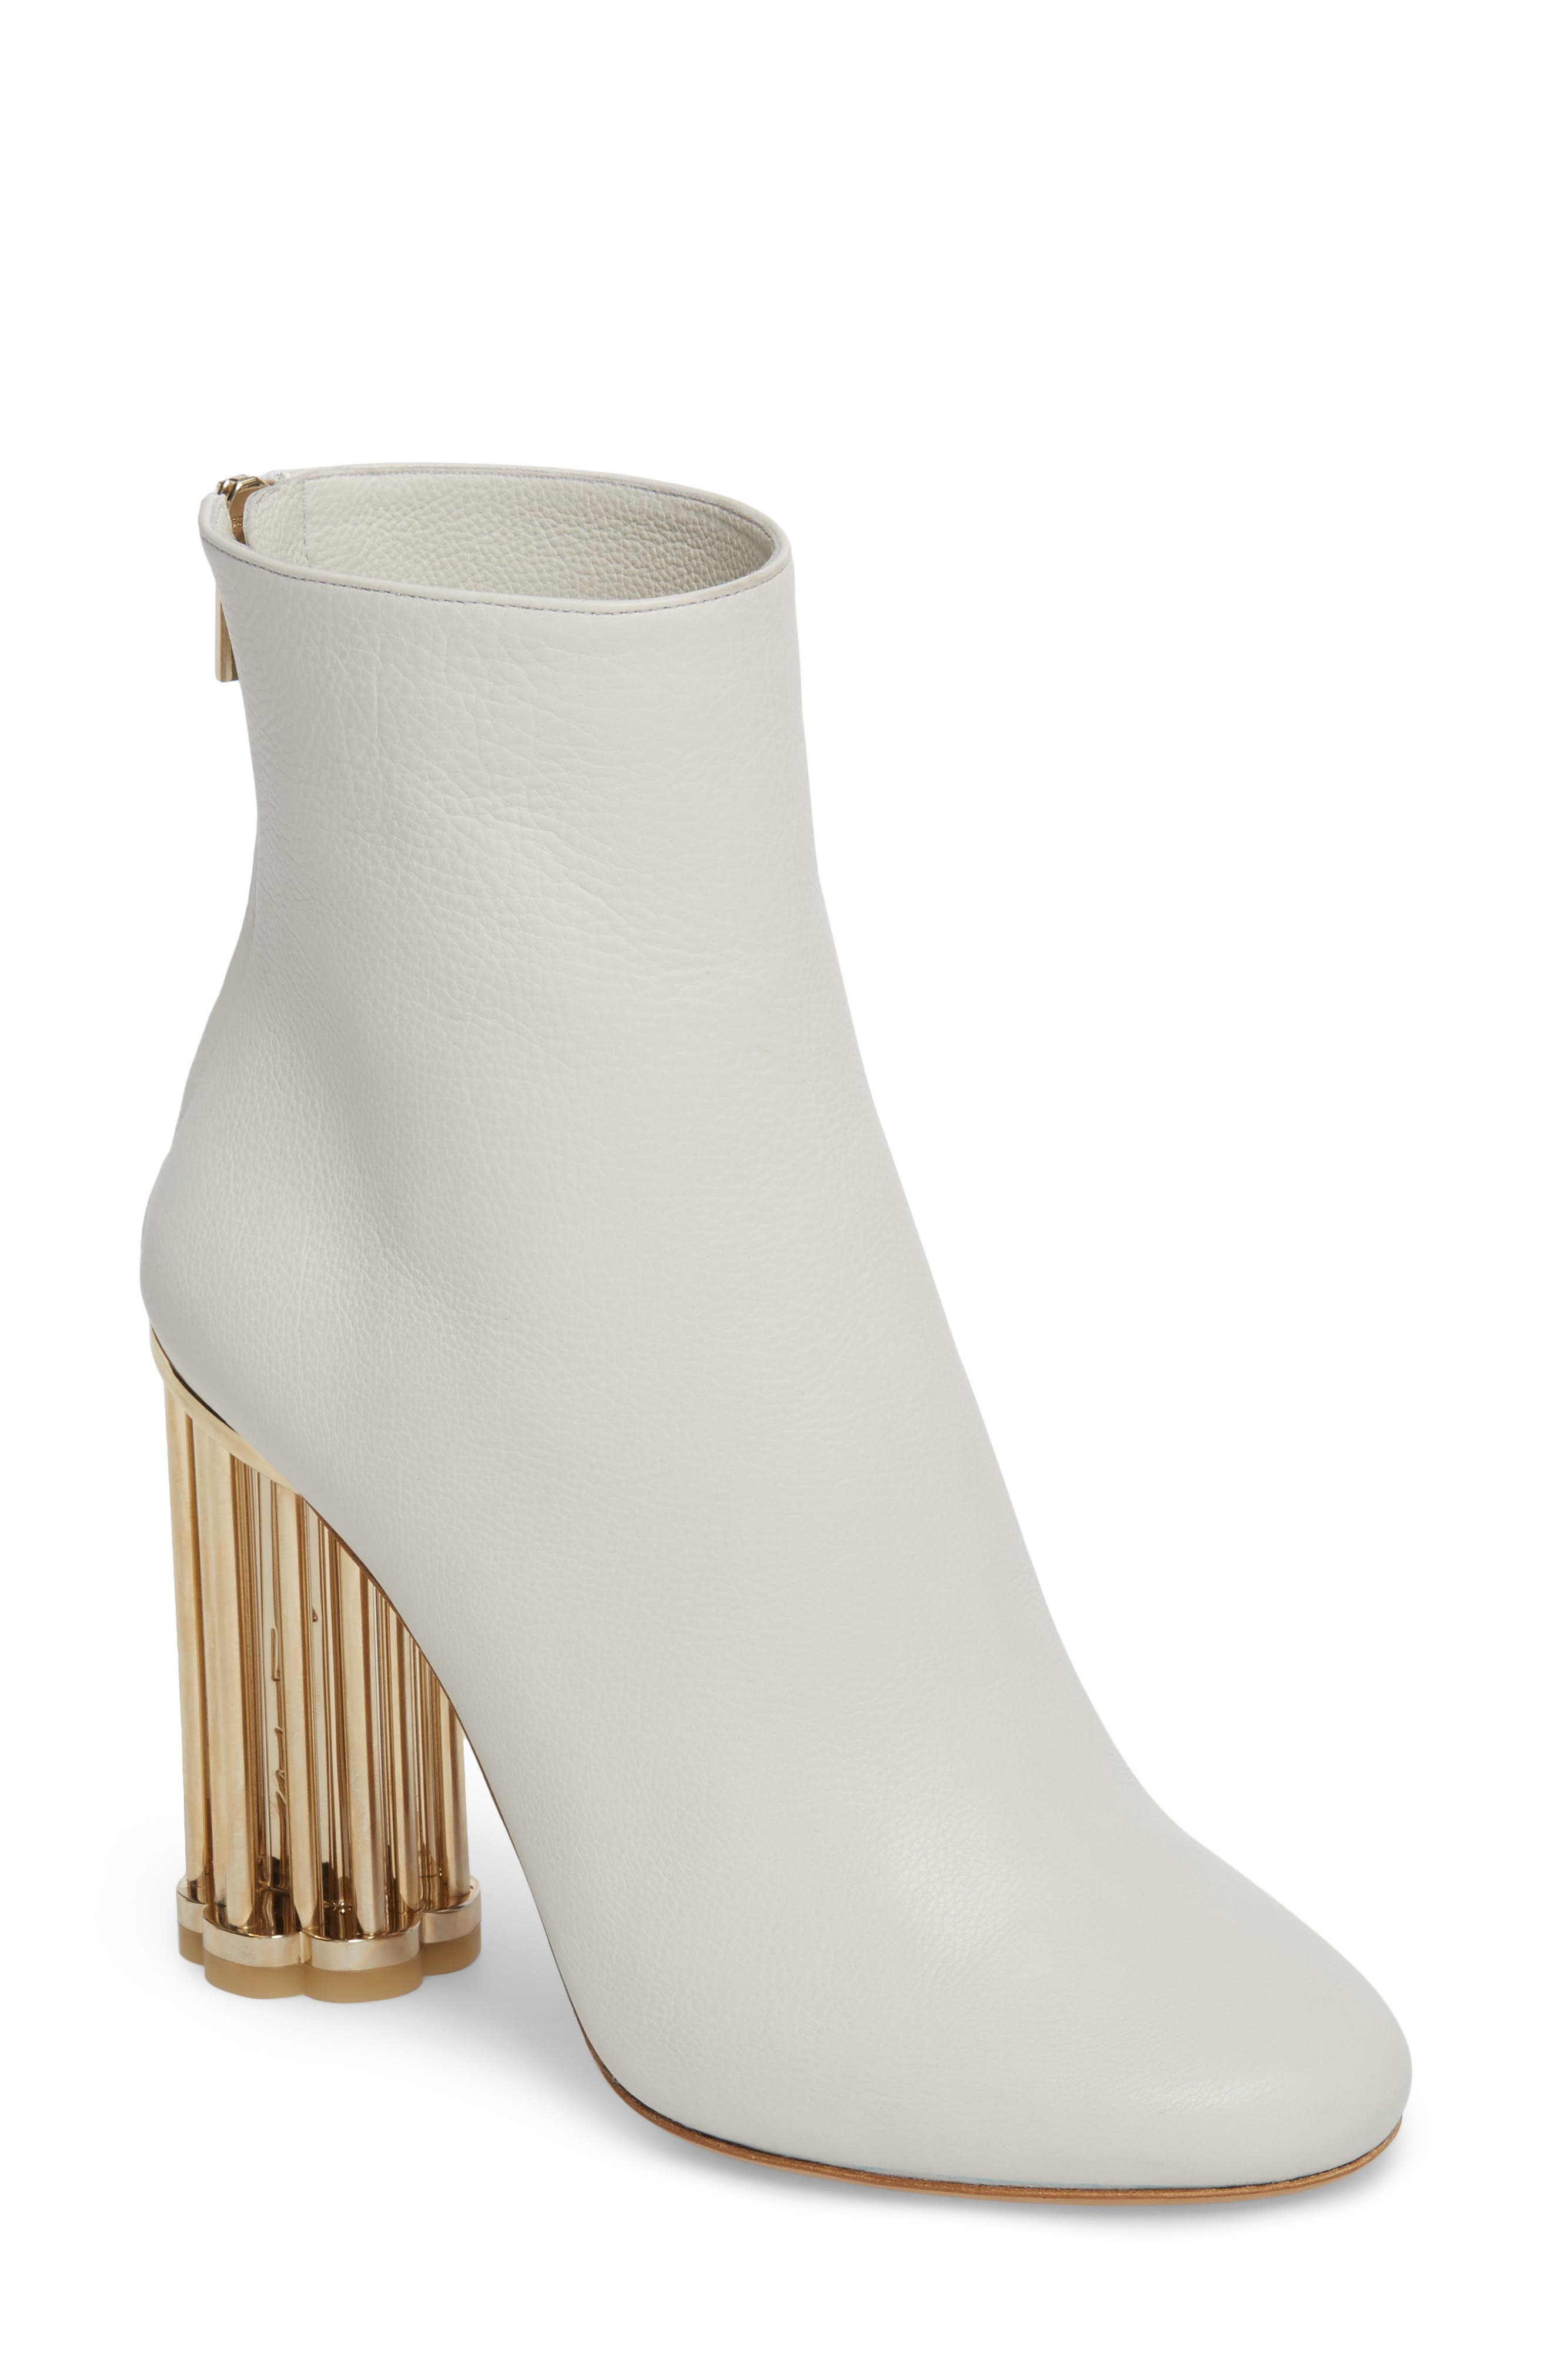 Salvatore Ferragamo Coriano Statement Heel Bootie (Women)